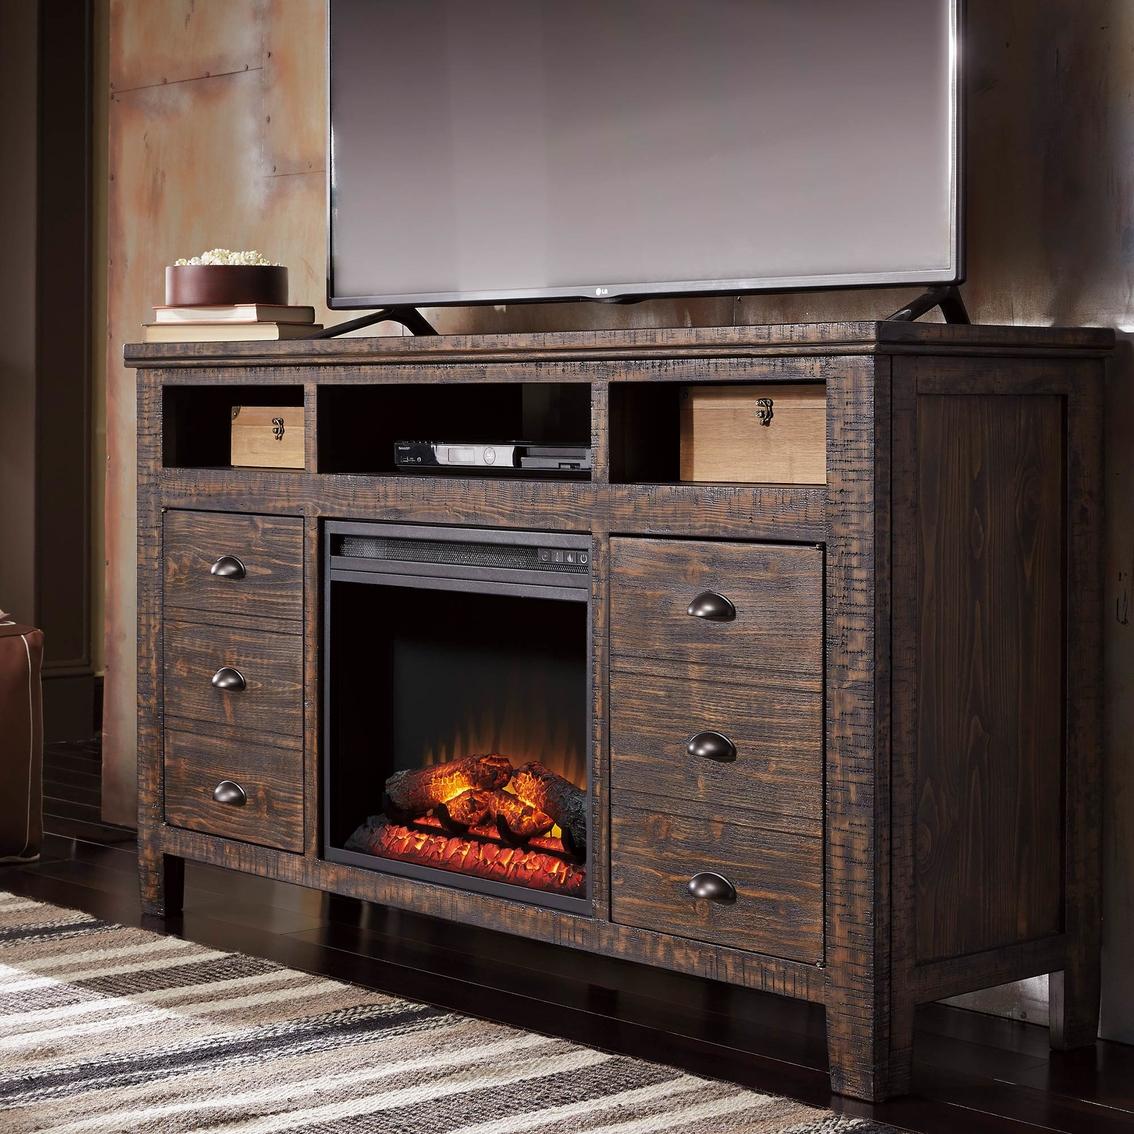 Ashley Fireplace Insert Warranty